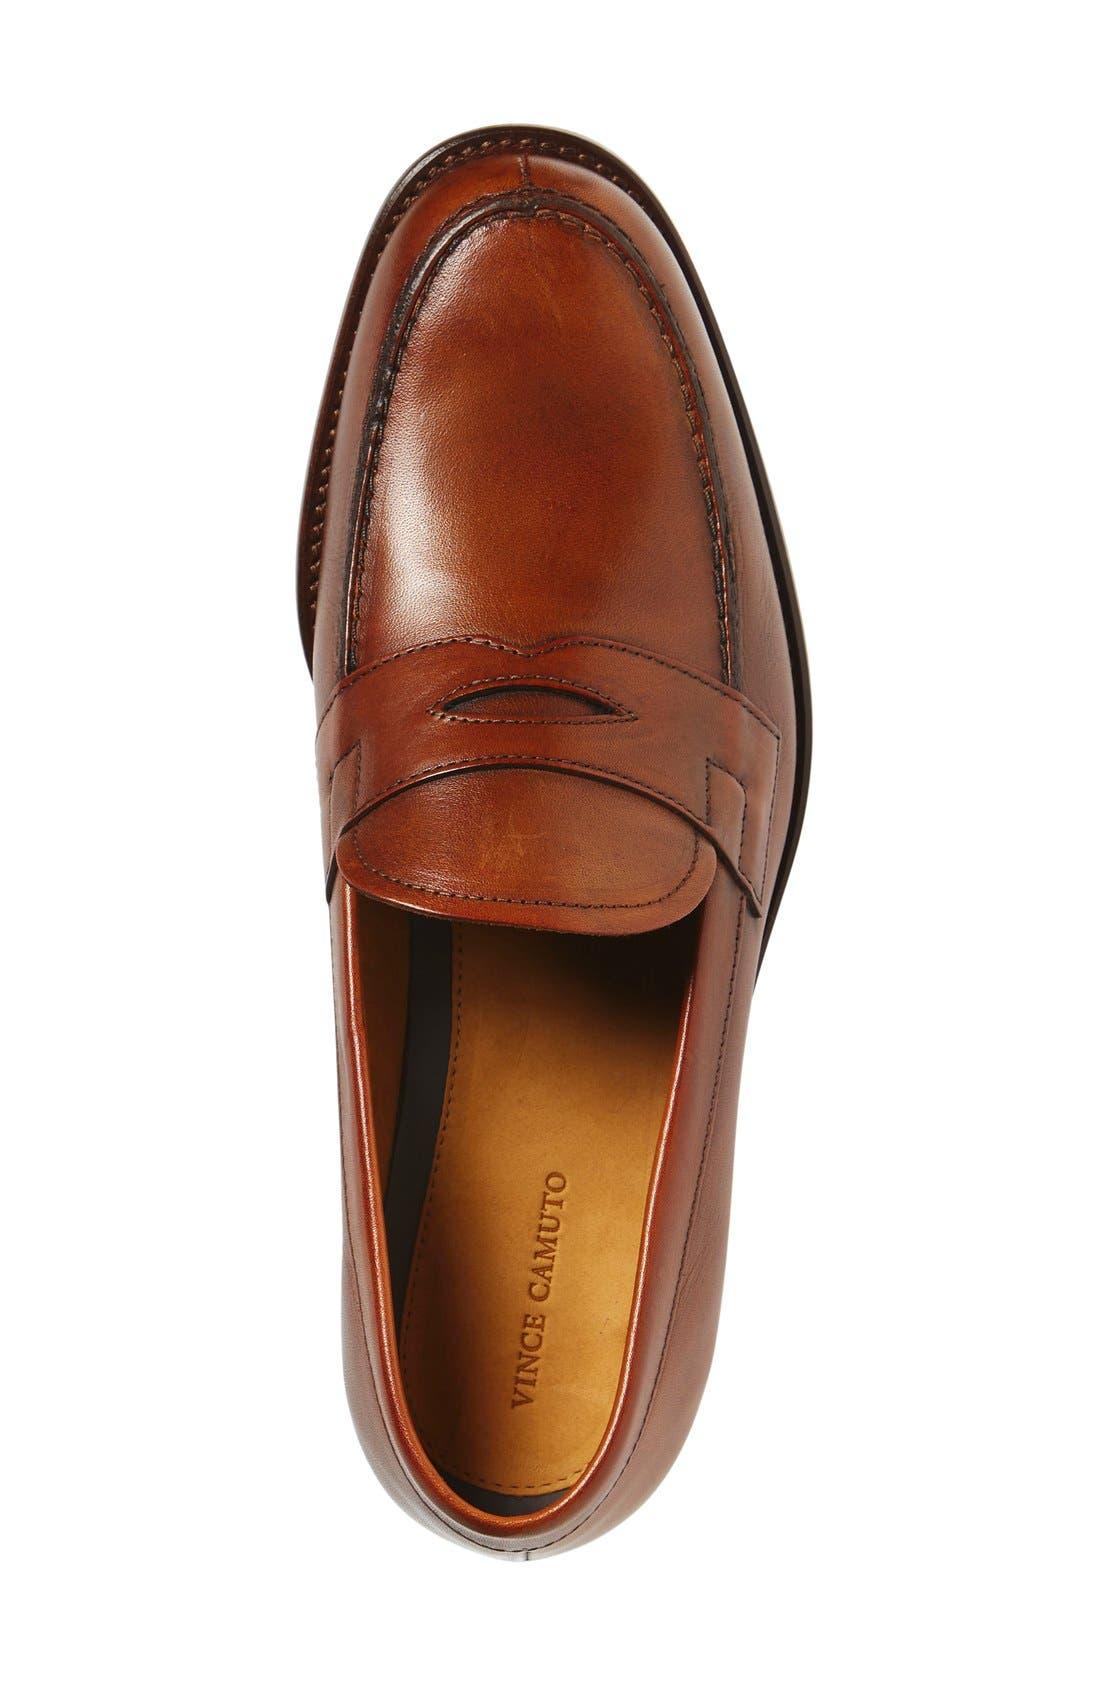 'Nacher' Loafer,                             Alternate thumbnail 4, color,                             Cognac Leather